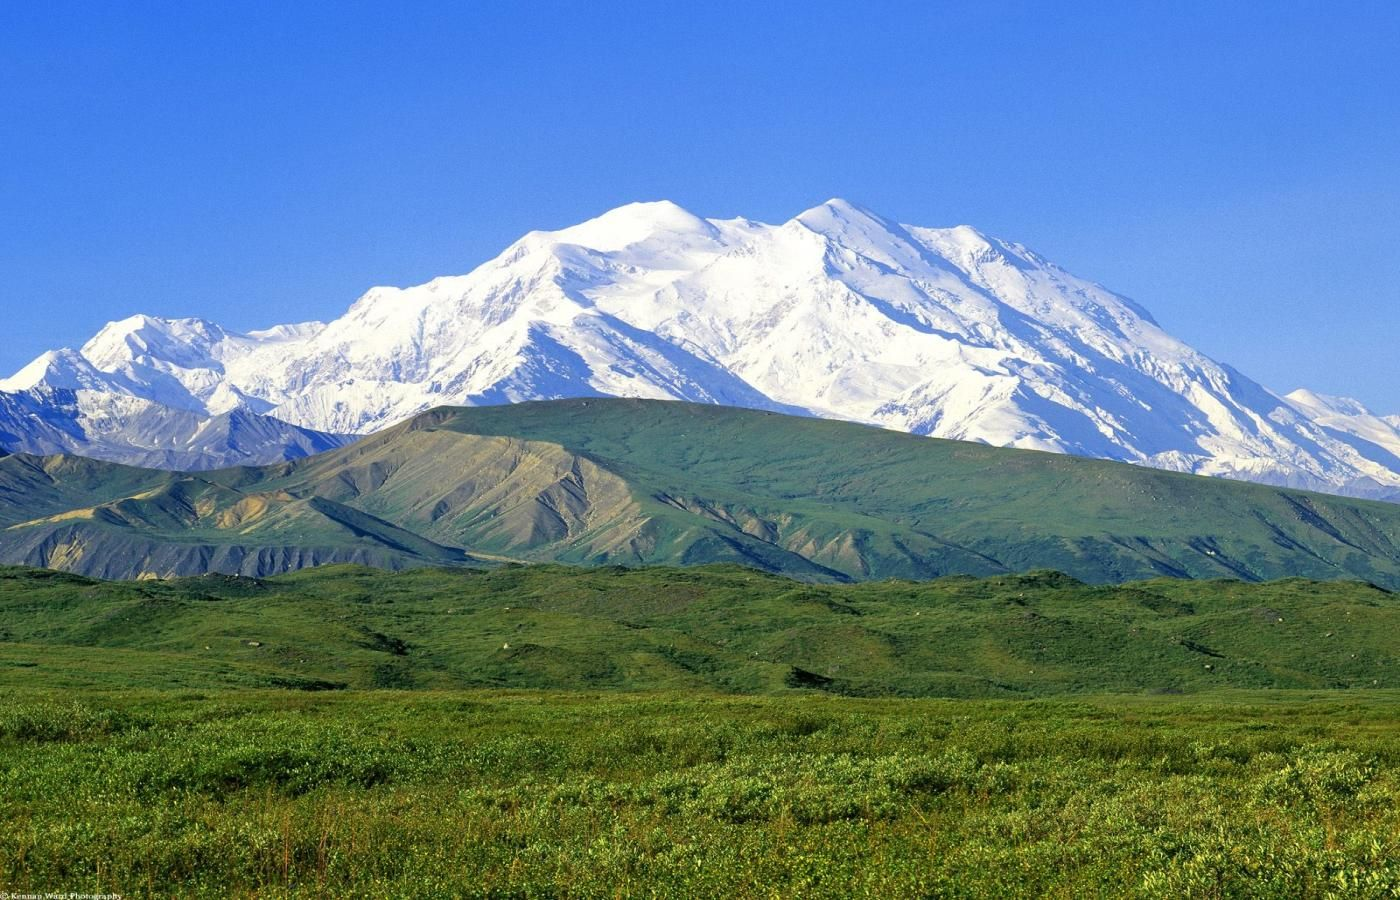 Una Montaña Nevada: Montanas-nevadas-de-alaska-92_1400x900.jpg (1400×900